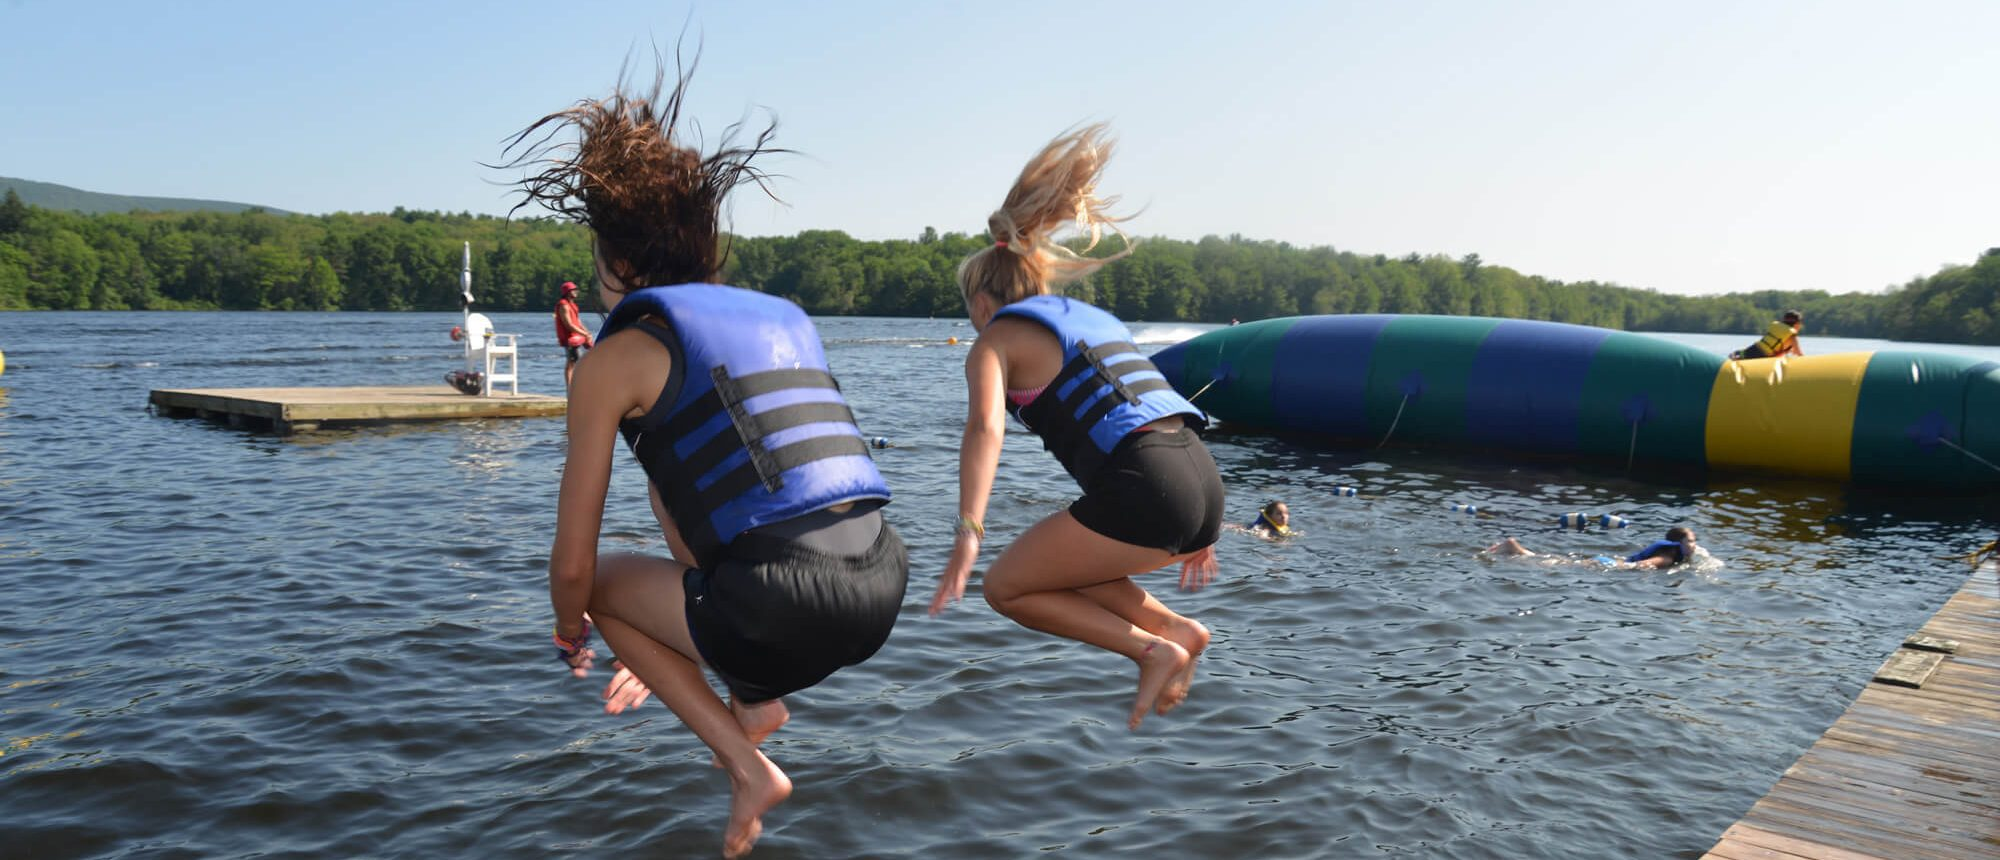 swimming instructors in america